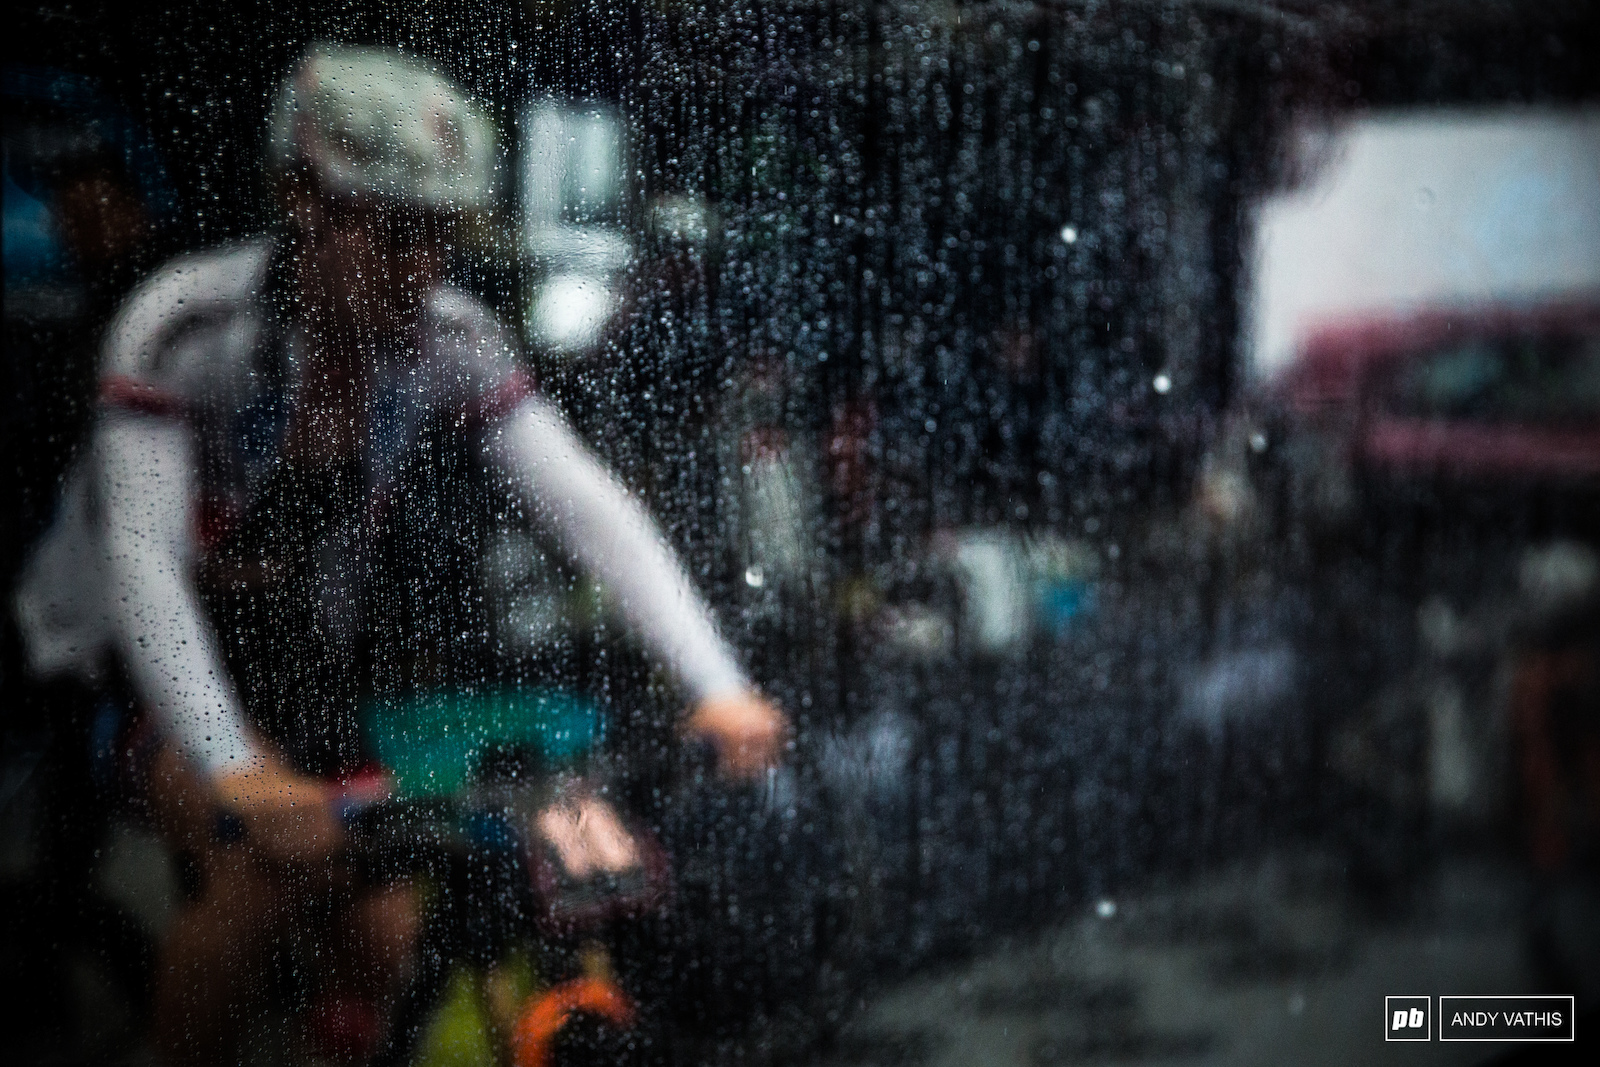 The rain began to fall heavy as soon as the women s field began their warm ups.